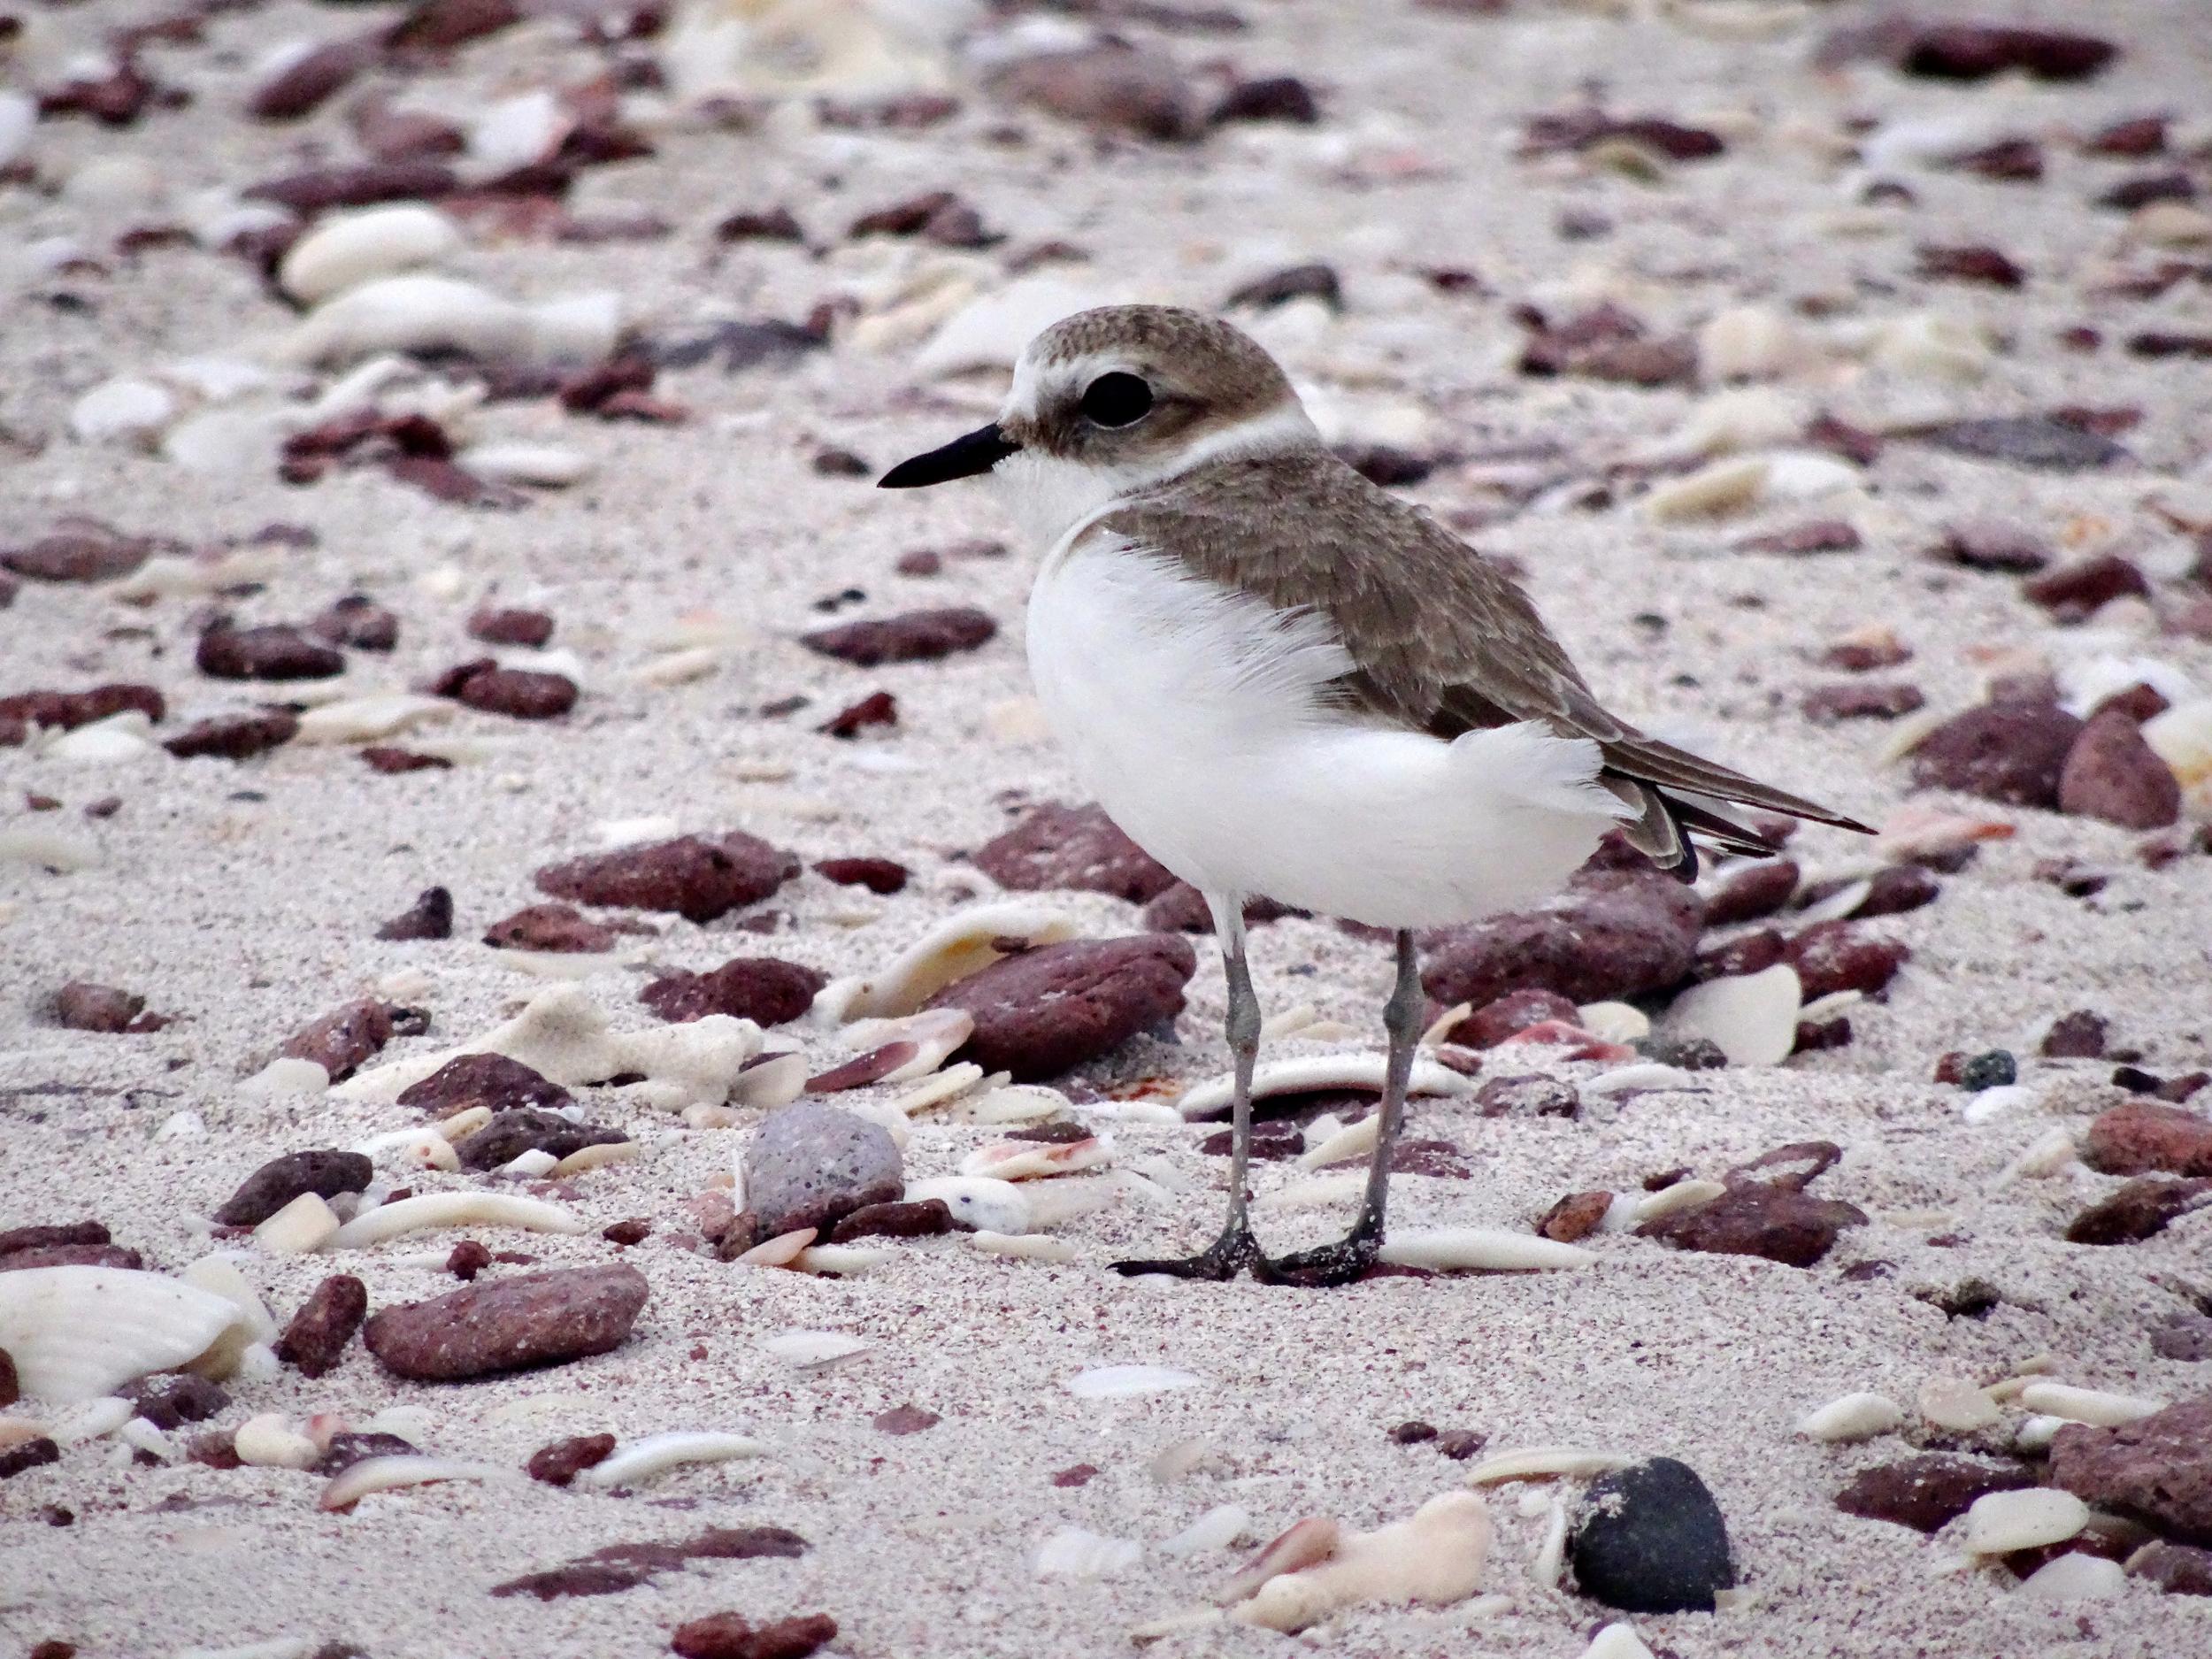 15. Shorebird